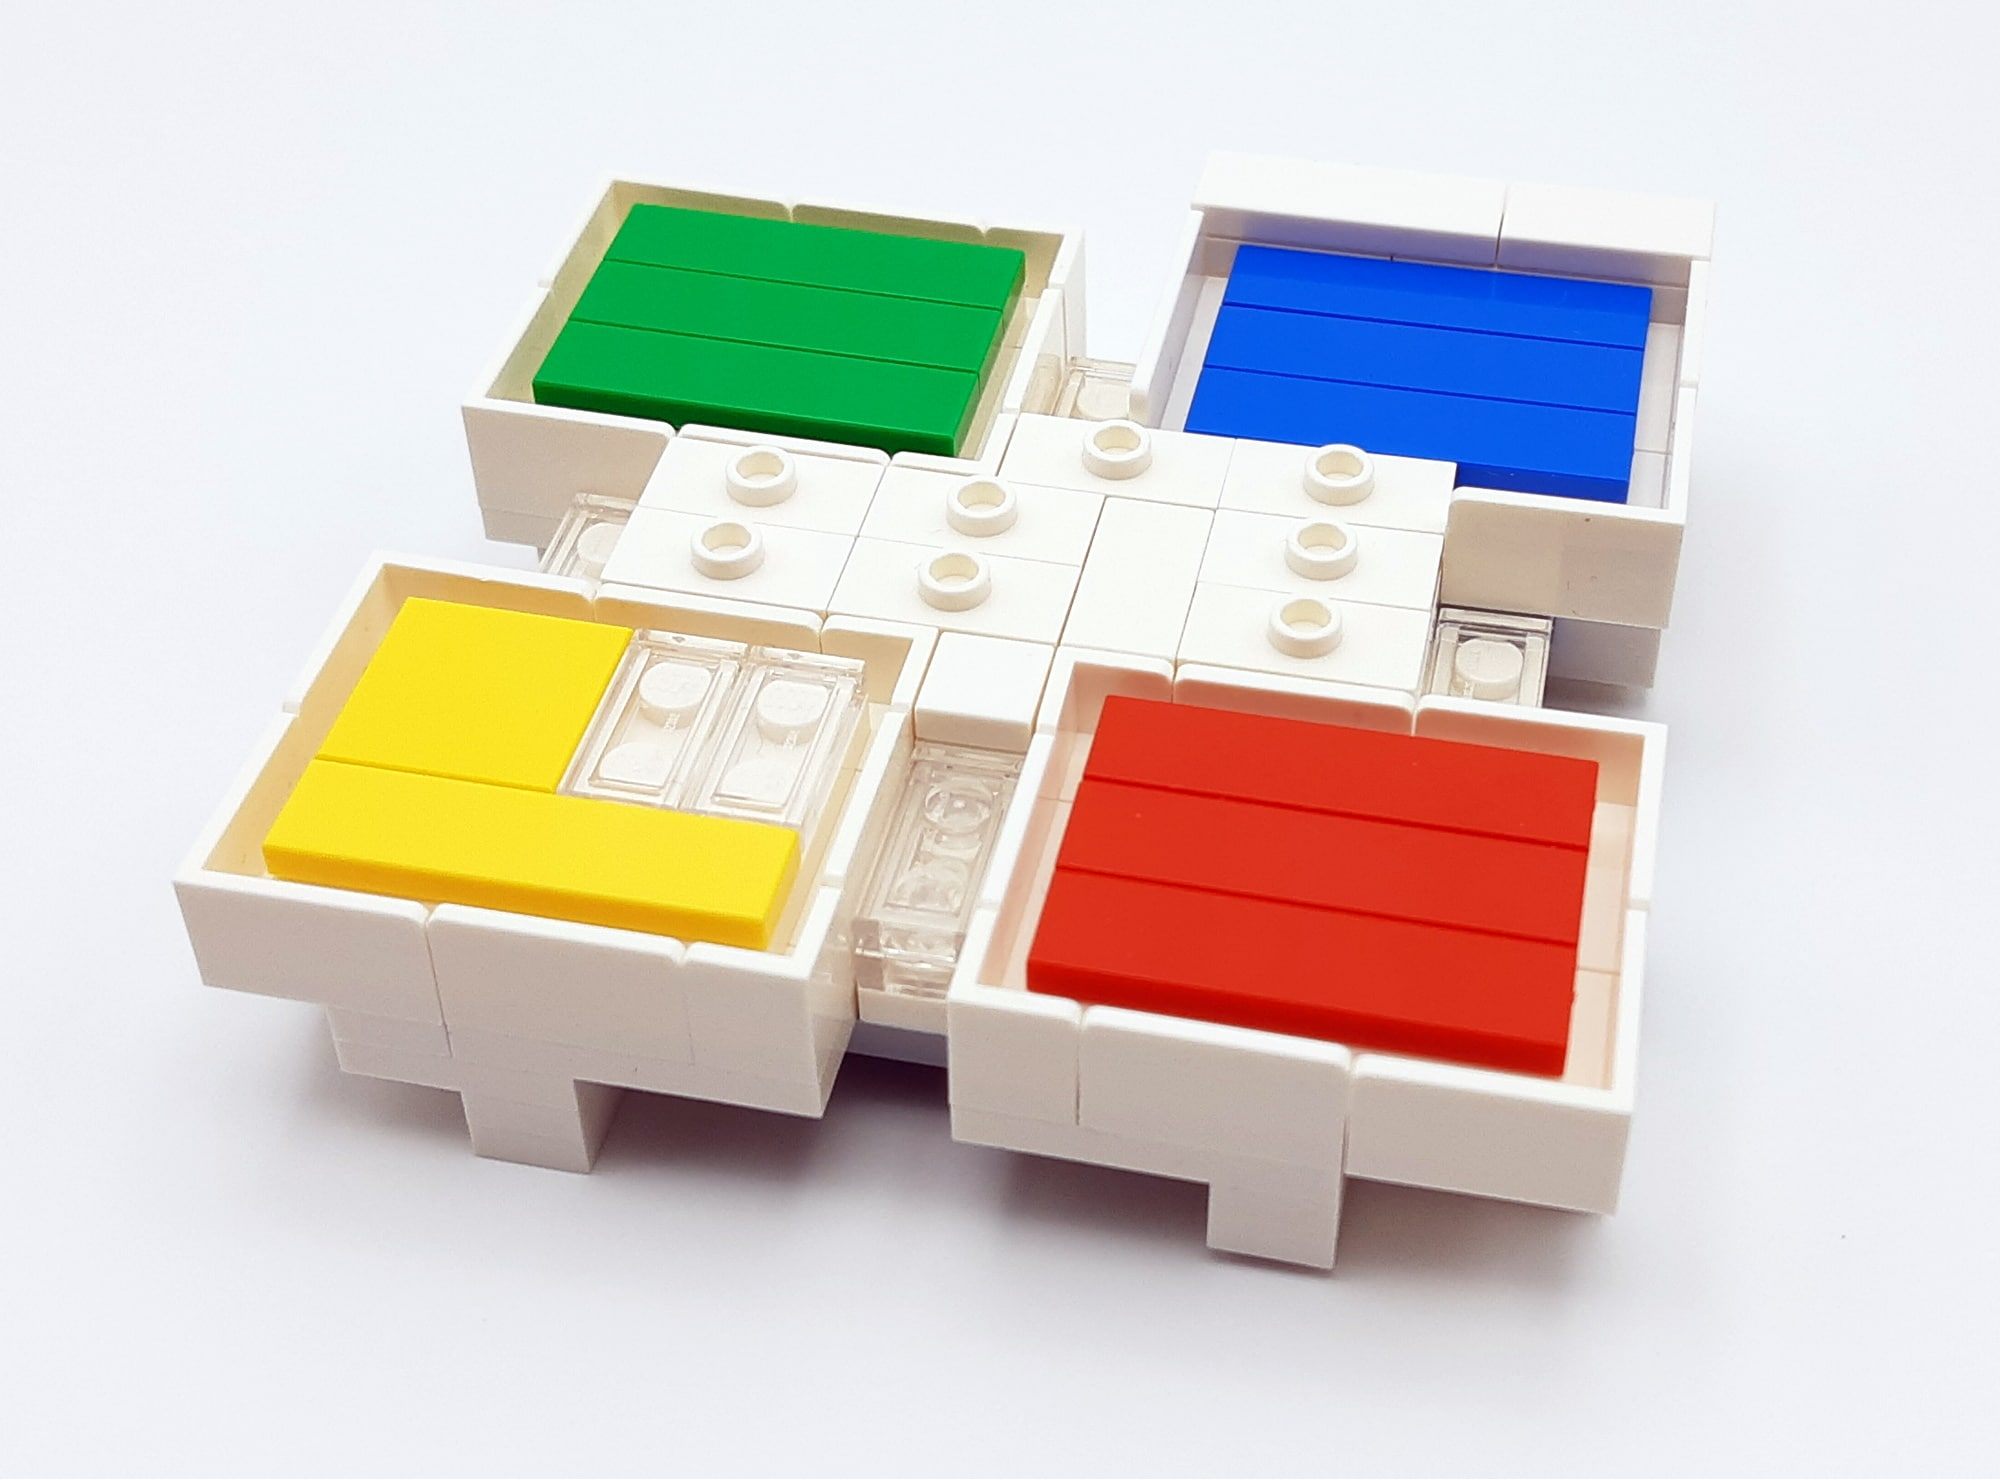 LEGO 21037 - LEGO House Baubschnitt erster Stock 1